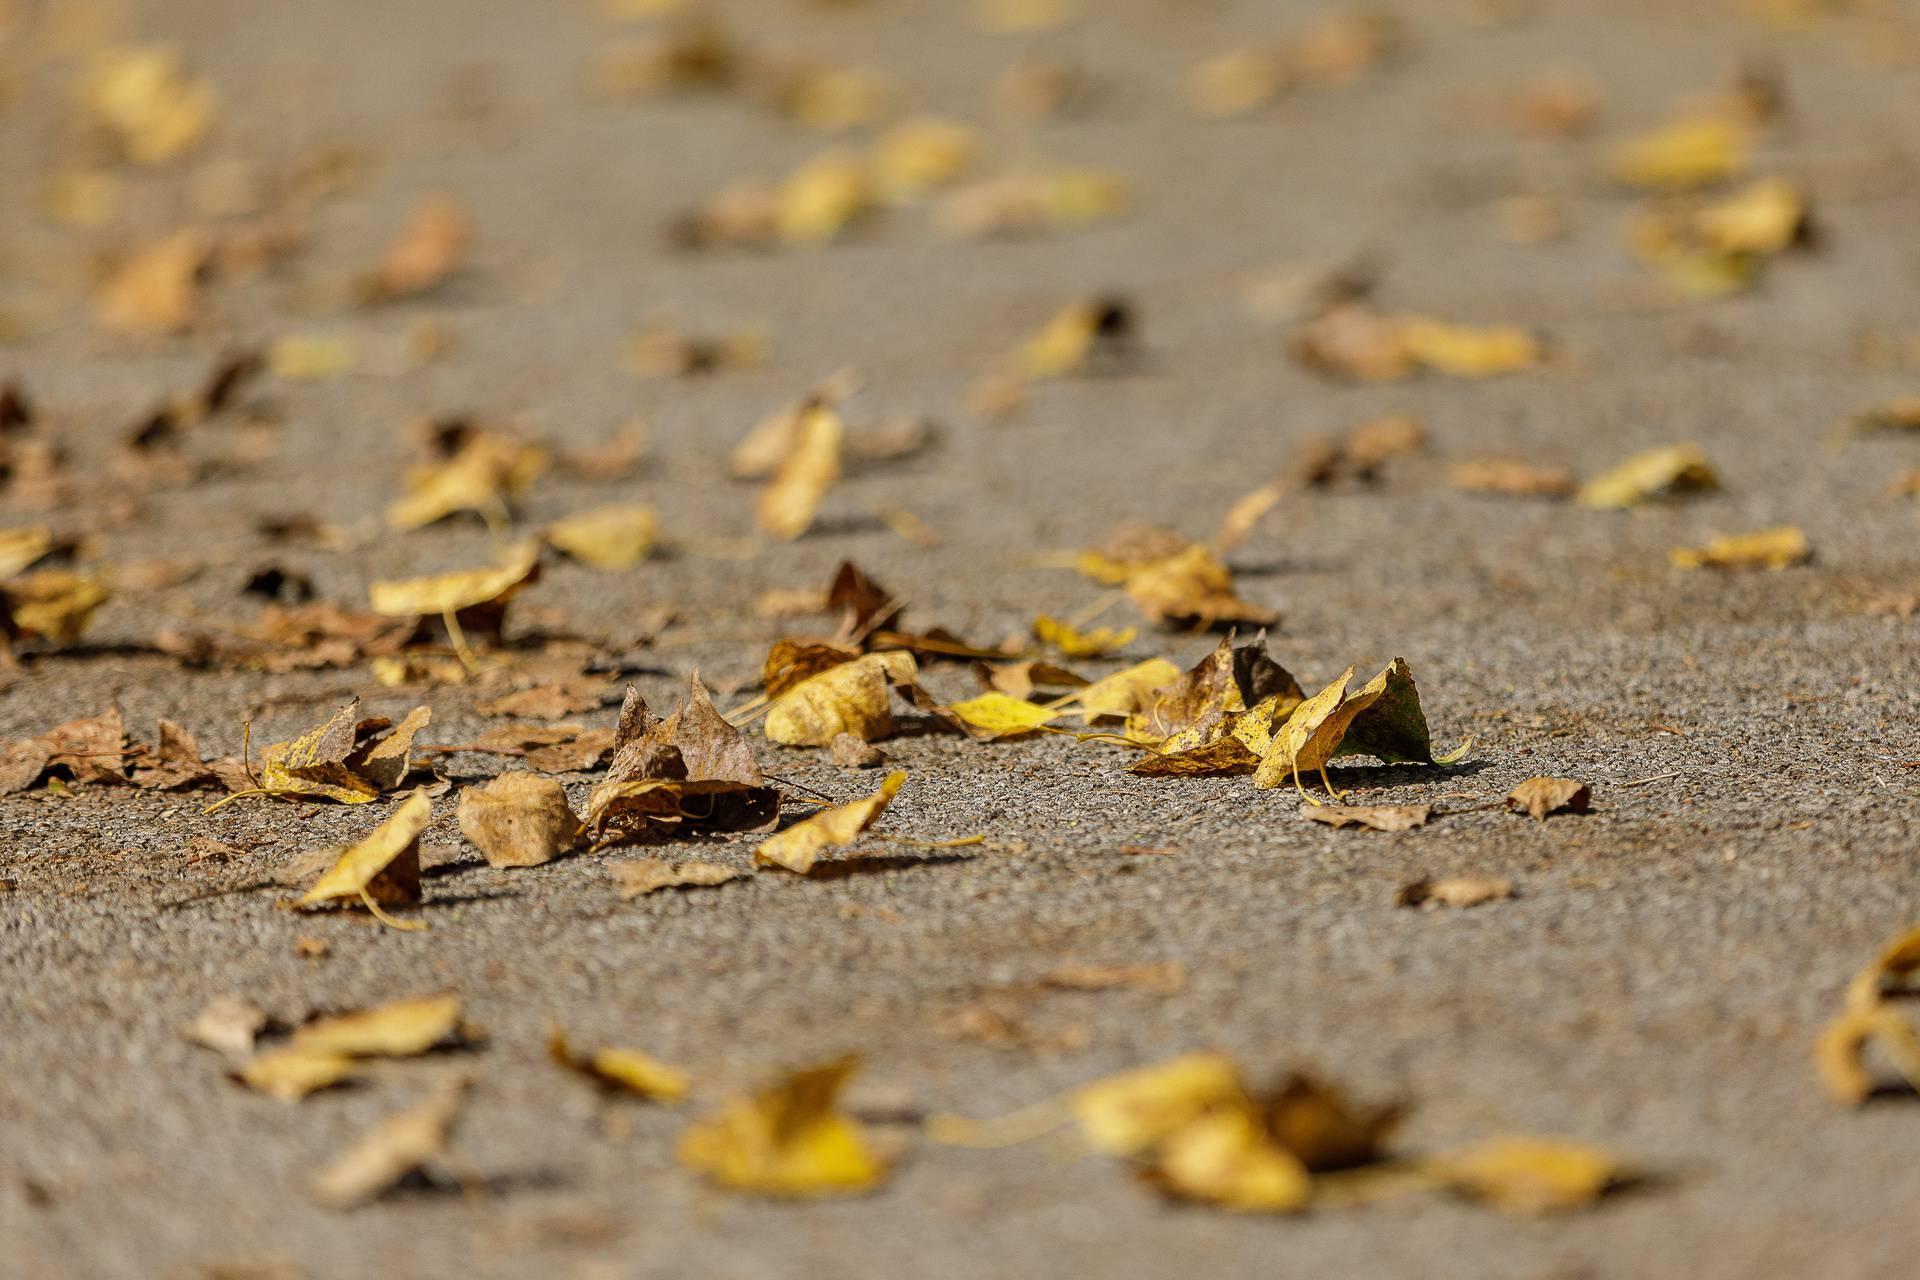 'Tiho, o tiho govori mi jesen: Šuštanjem lišća i šapatom kiše'